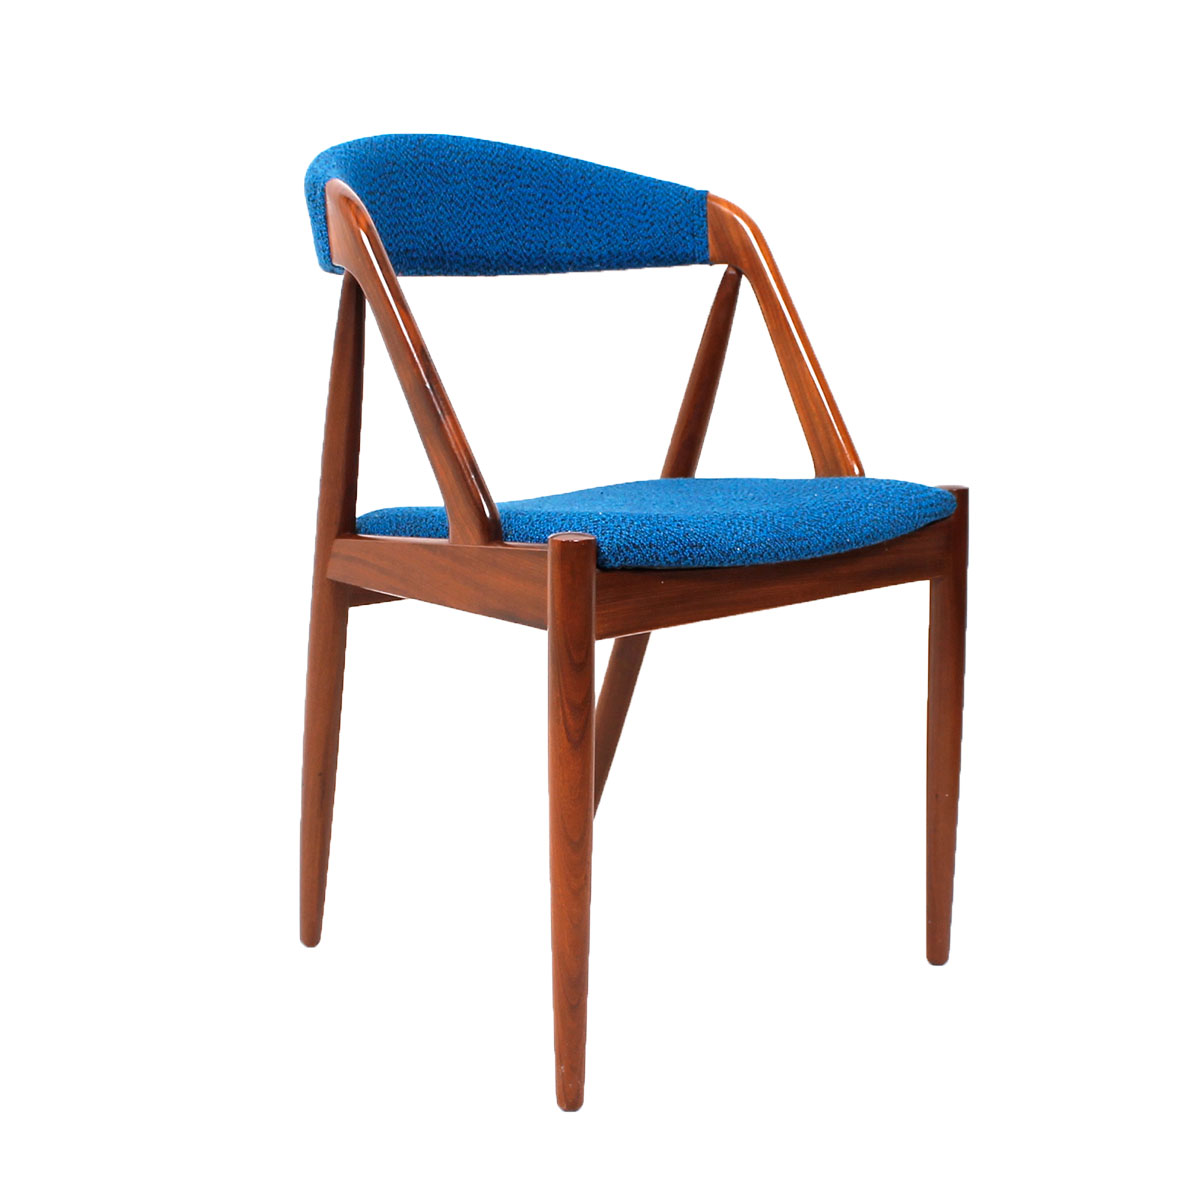 Modern mobler - Kai kristiansen chairs ...